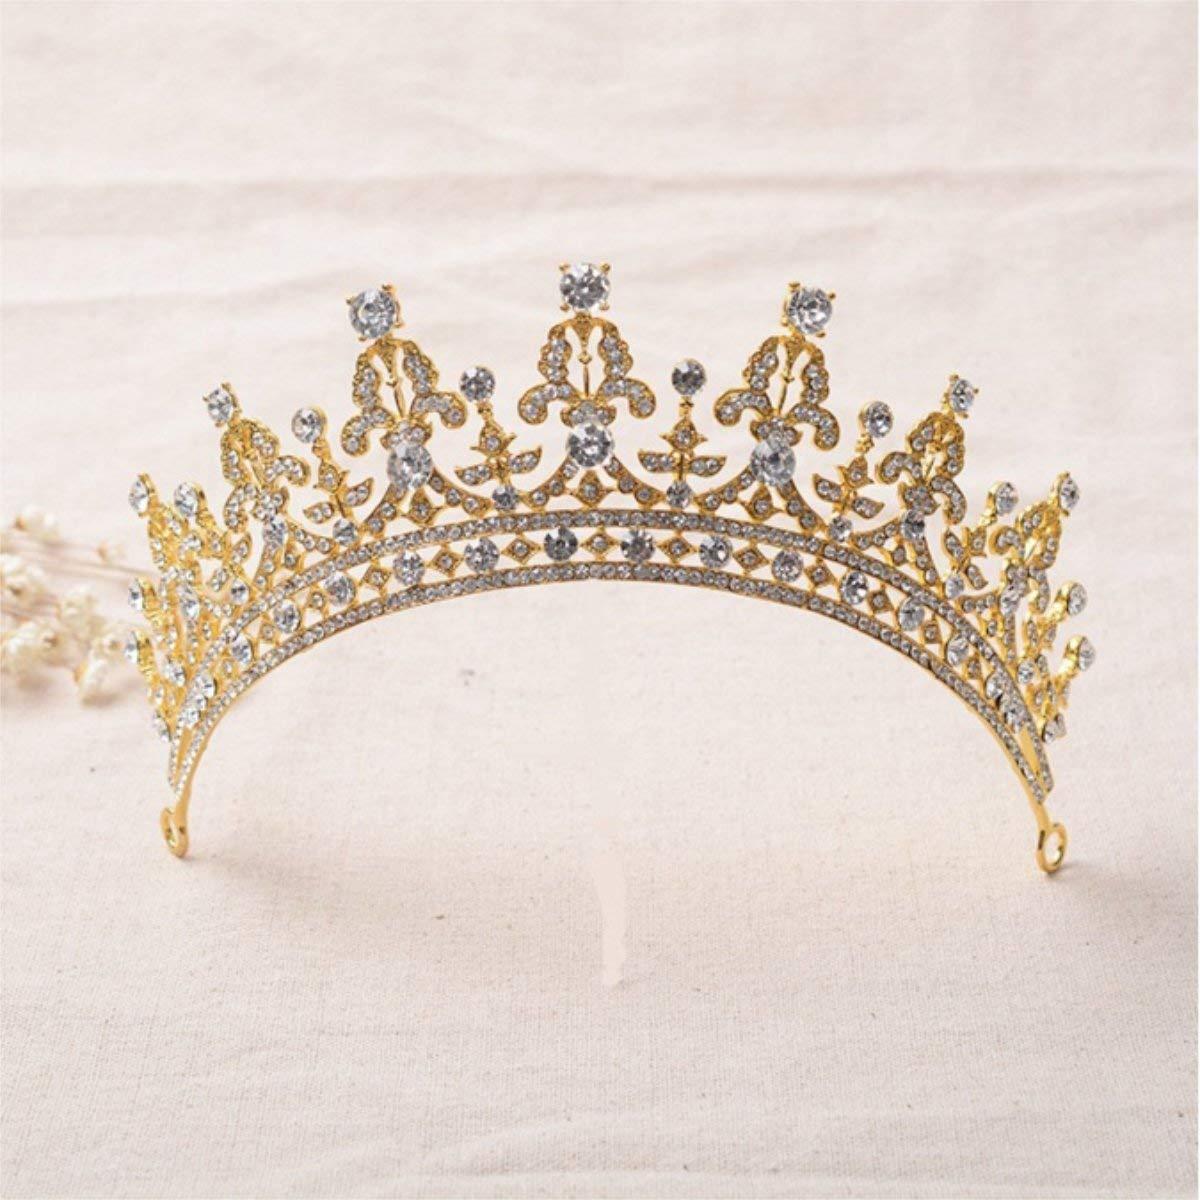 ... Hair Accessories Bridal Jewelry (Silver) 10.99. FUMUD Red Clear Wedding  Bridal Crystal Tiara Crowns Princess Queen Pageant Prom Rhinestone Tiara ... 5877bb4c3a79